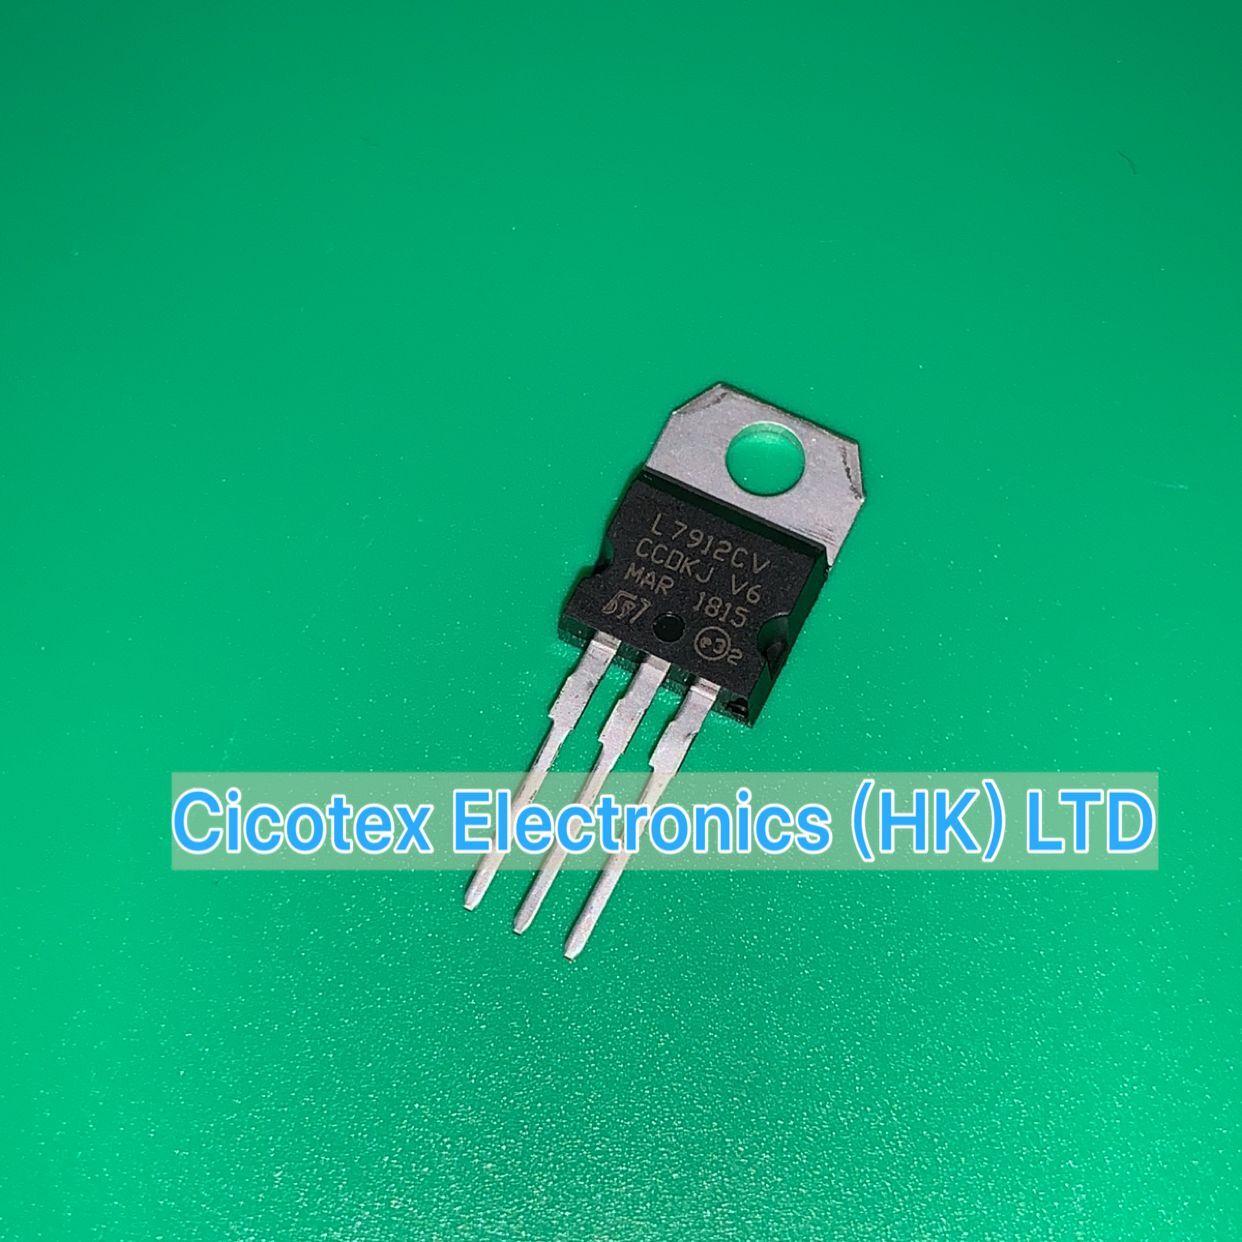 10 unids/lote L7912CV IC regulador lineal-12 V 1.5A TO220AB reguladores de voltaje negativo